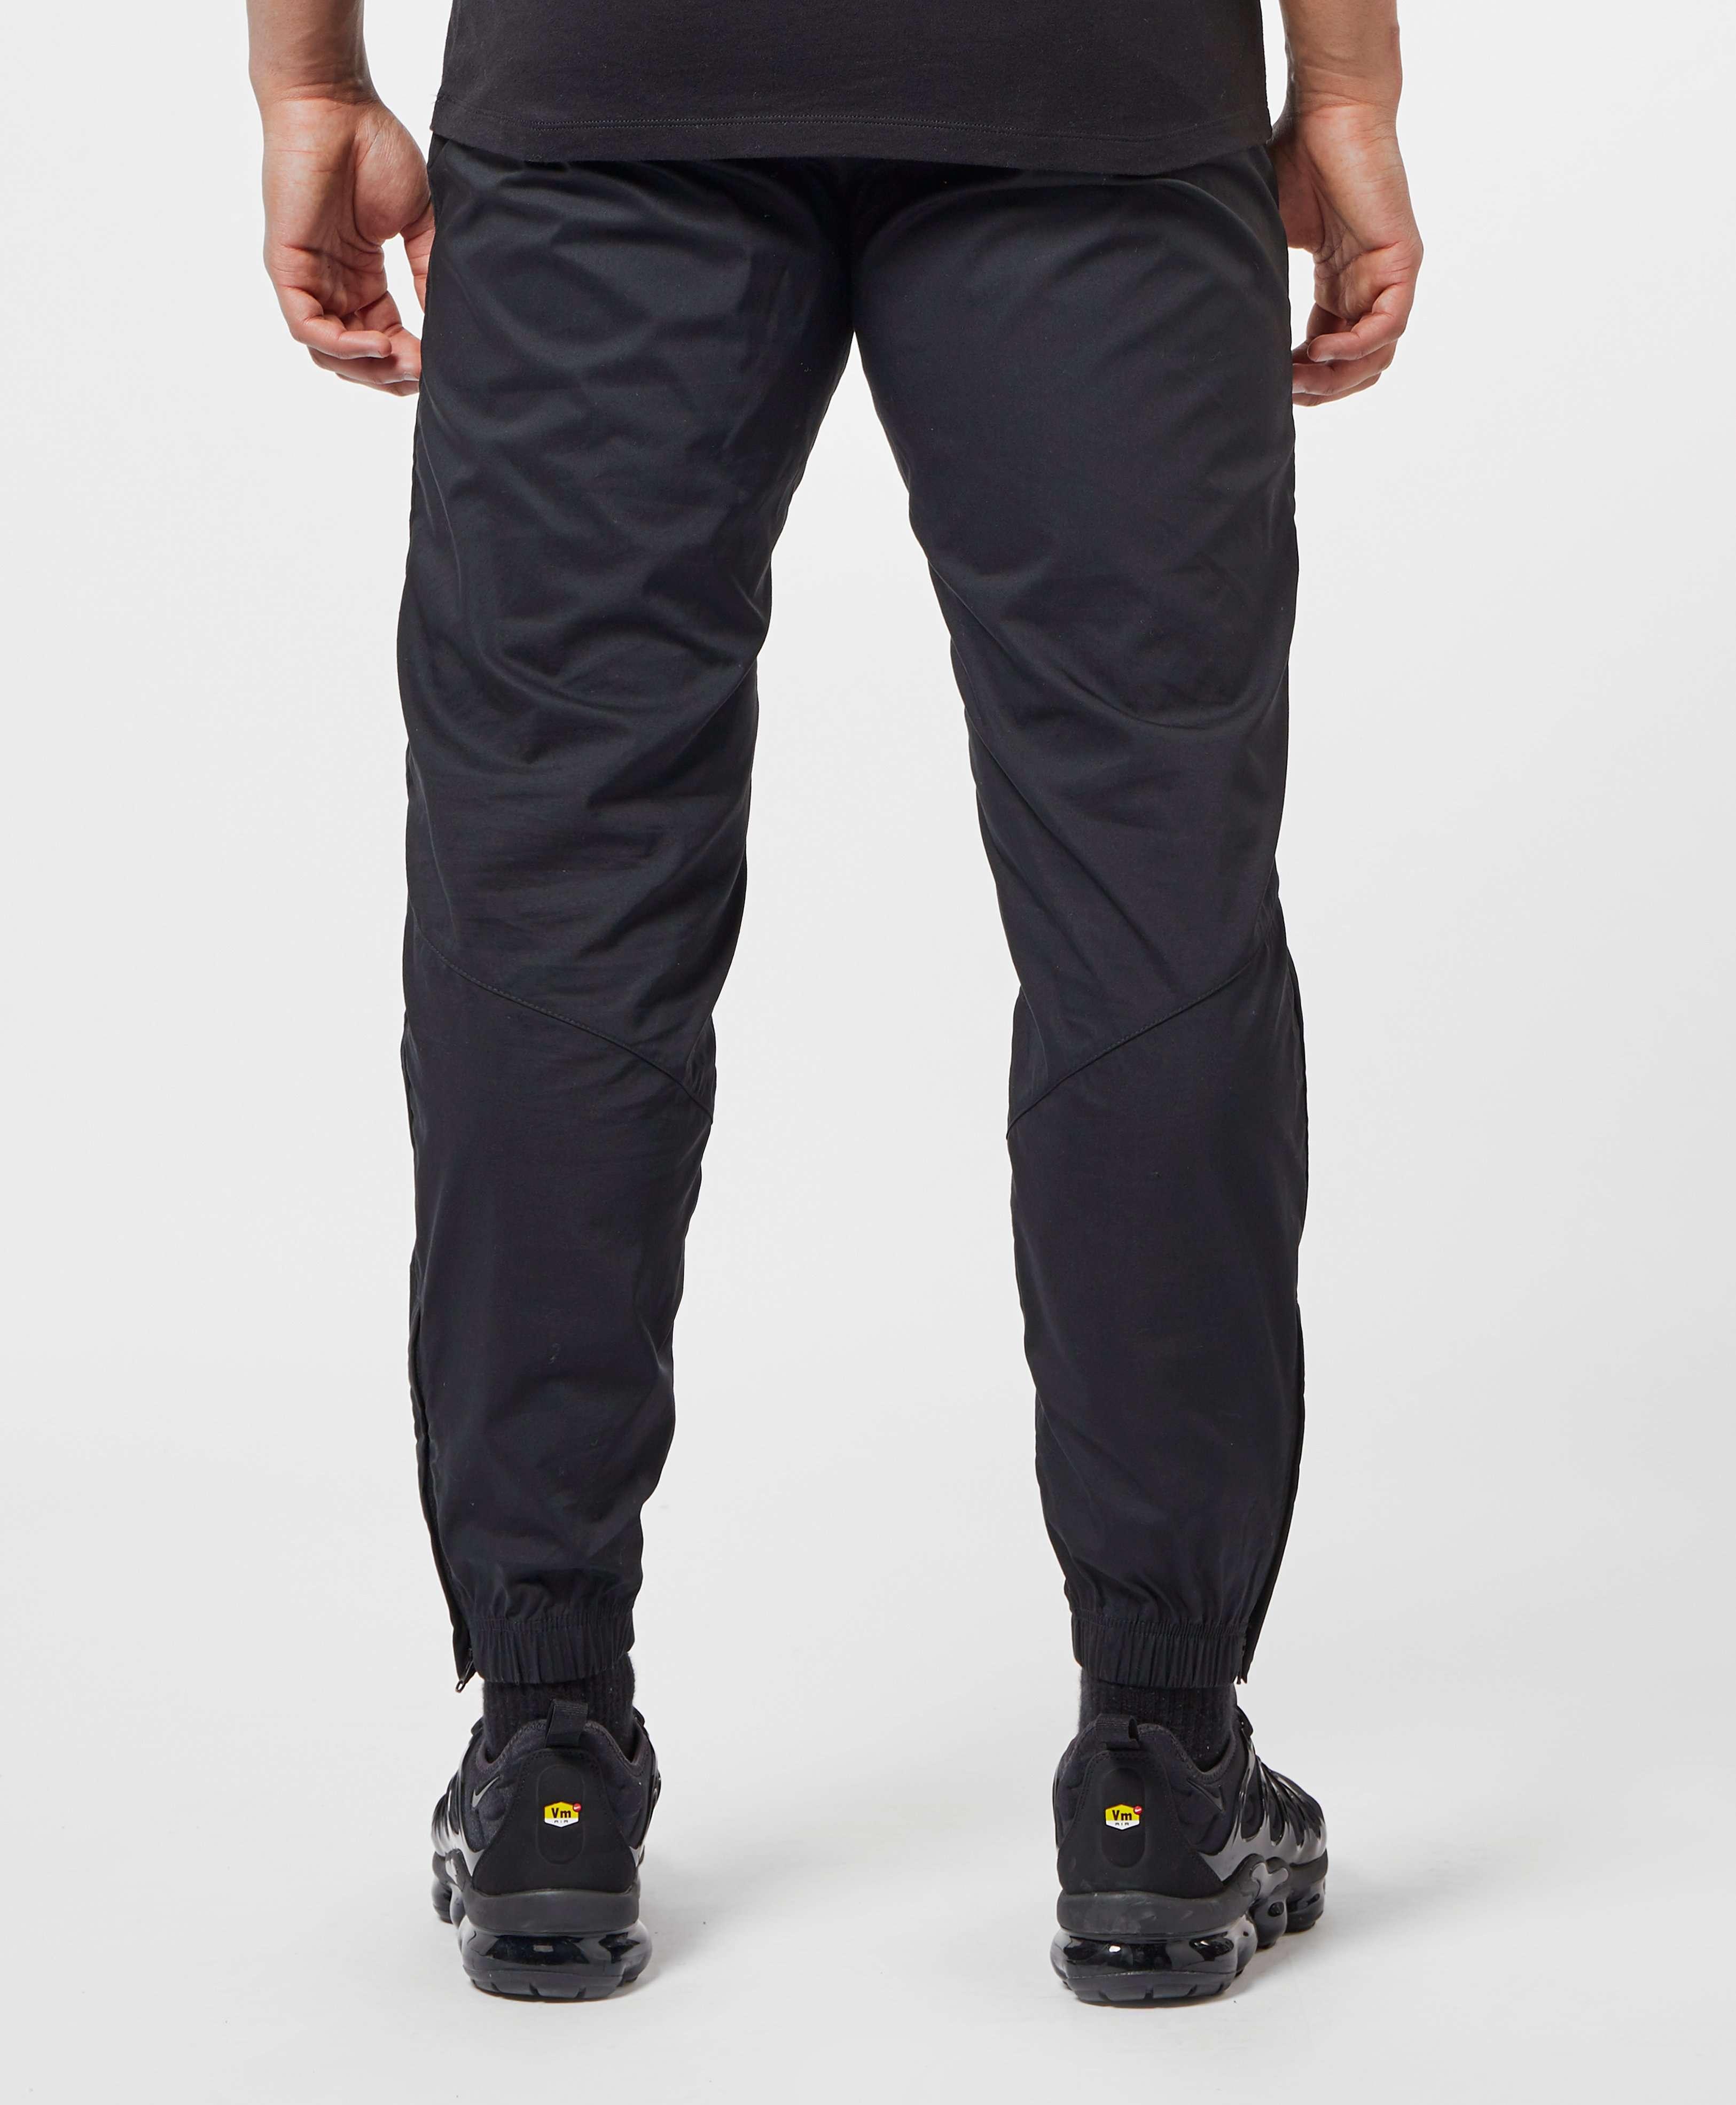 Nike Woven Cuffed Track Pants